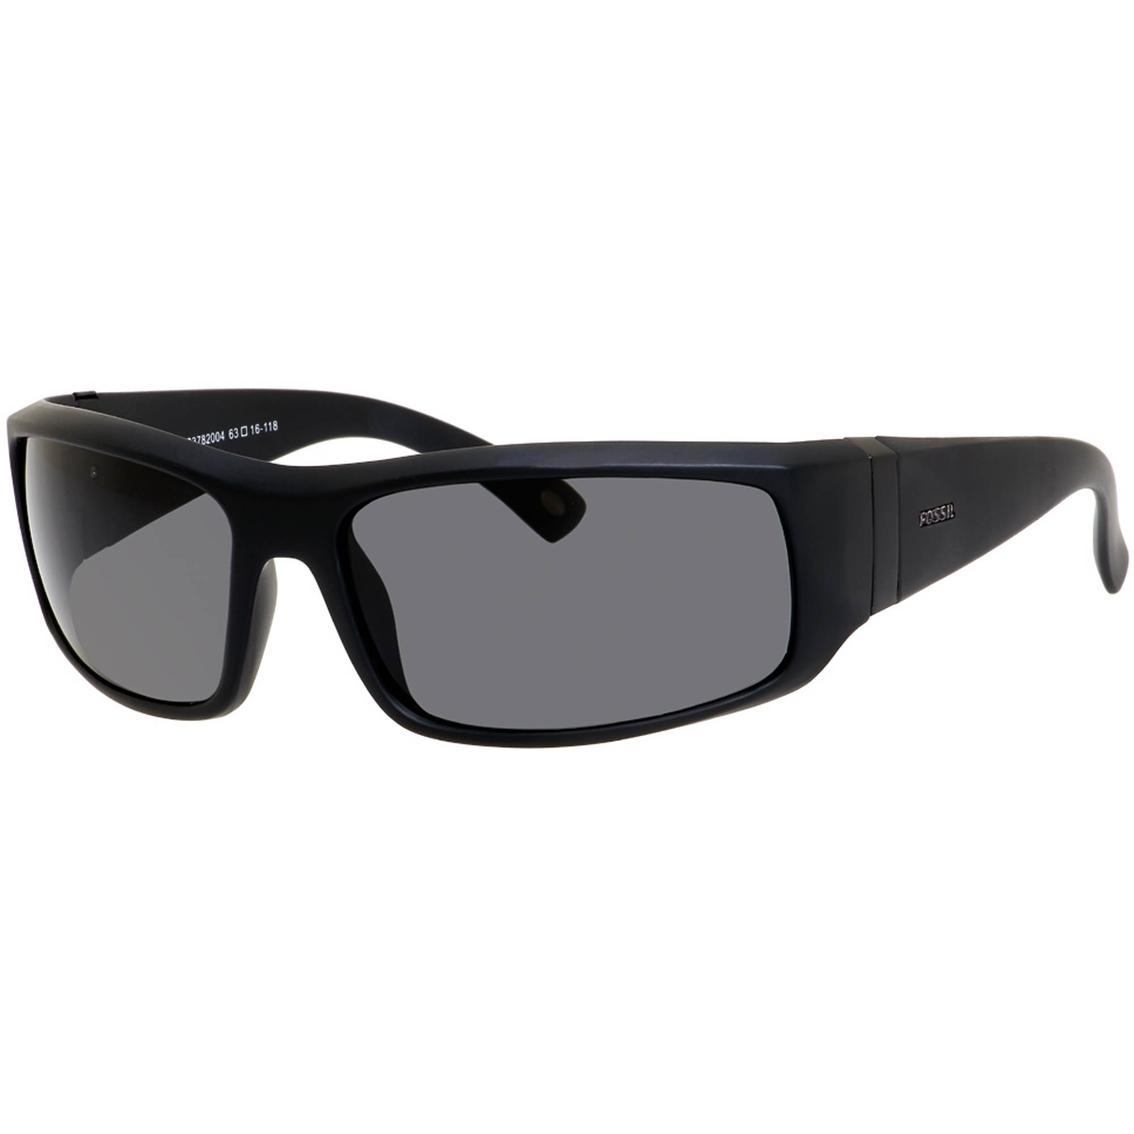 4c0b5c72c8b Fossil Womens Polarized Sunglasses